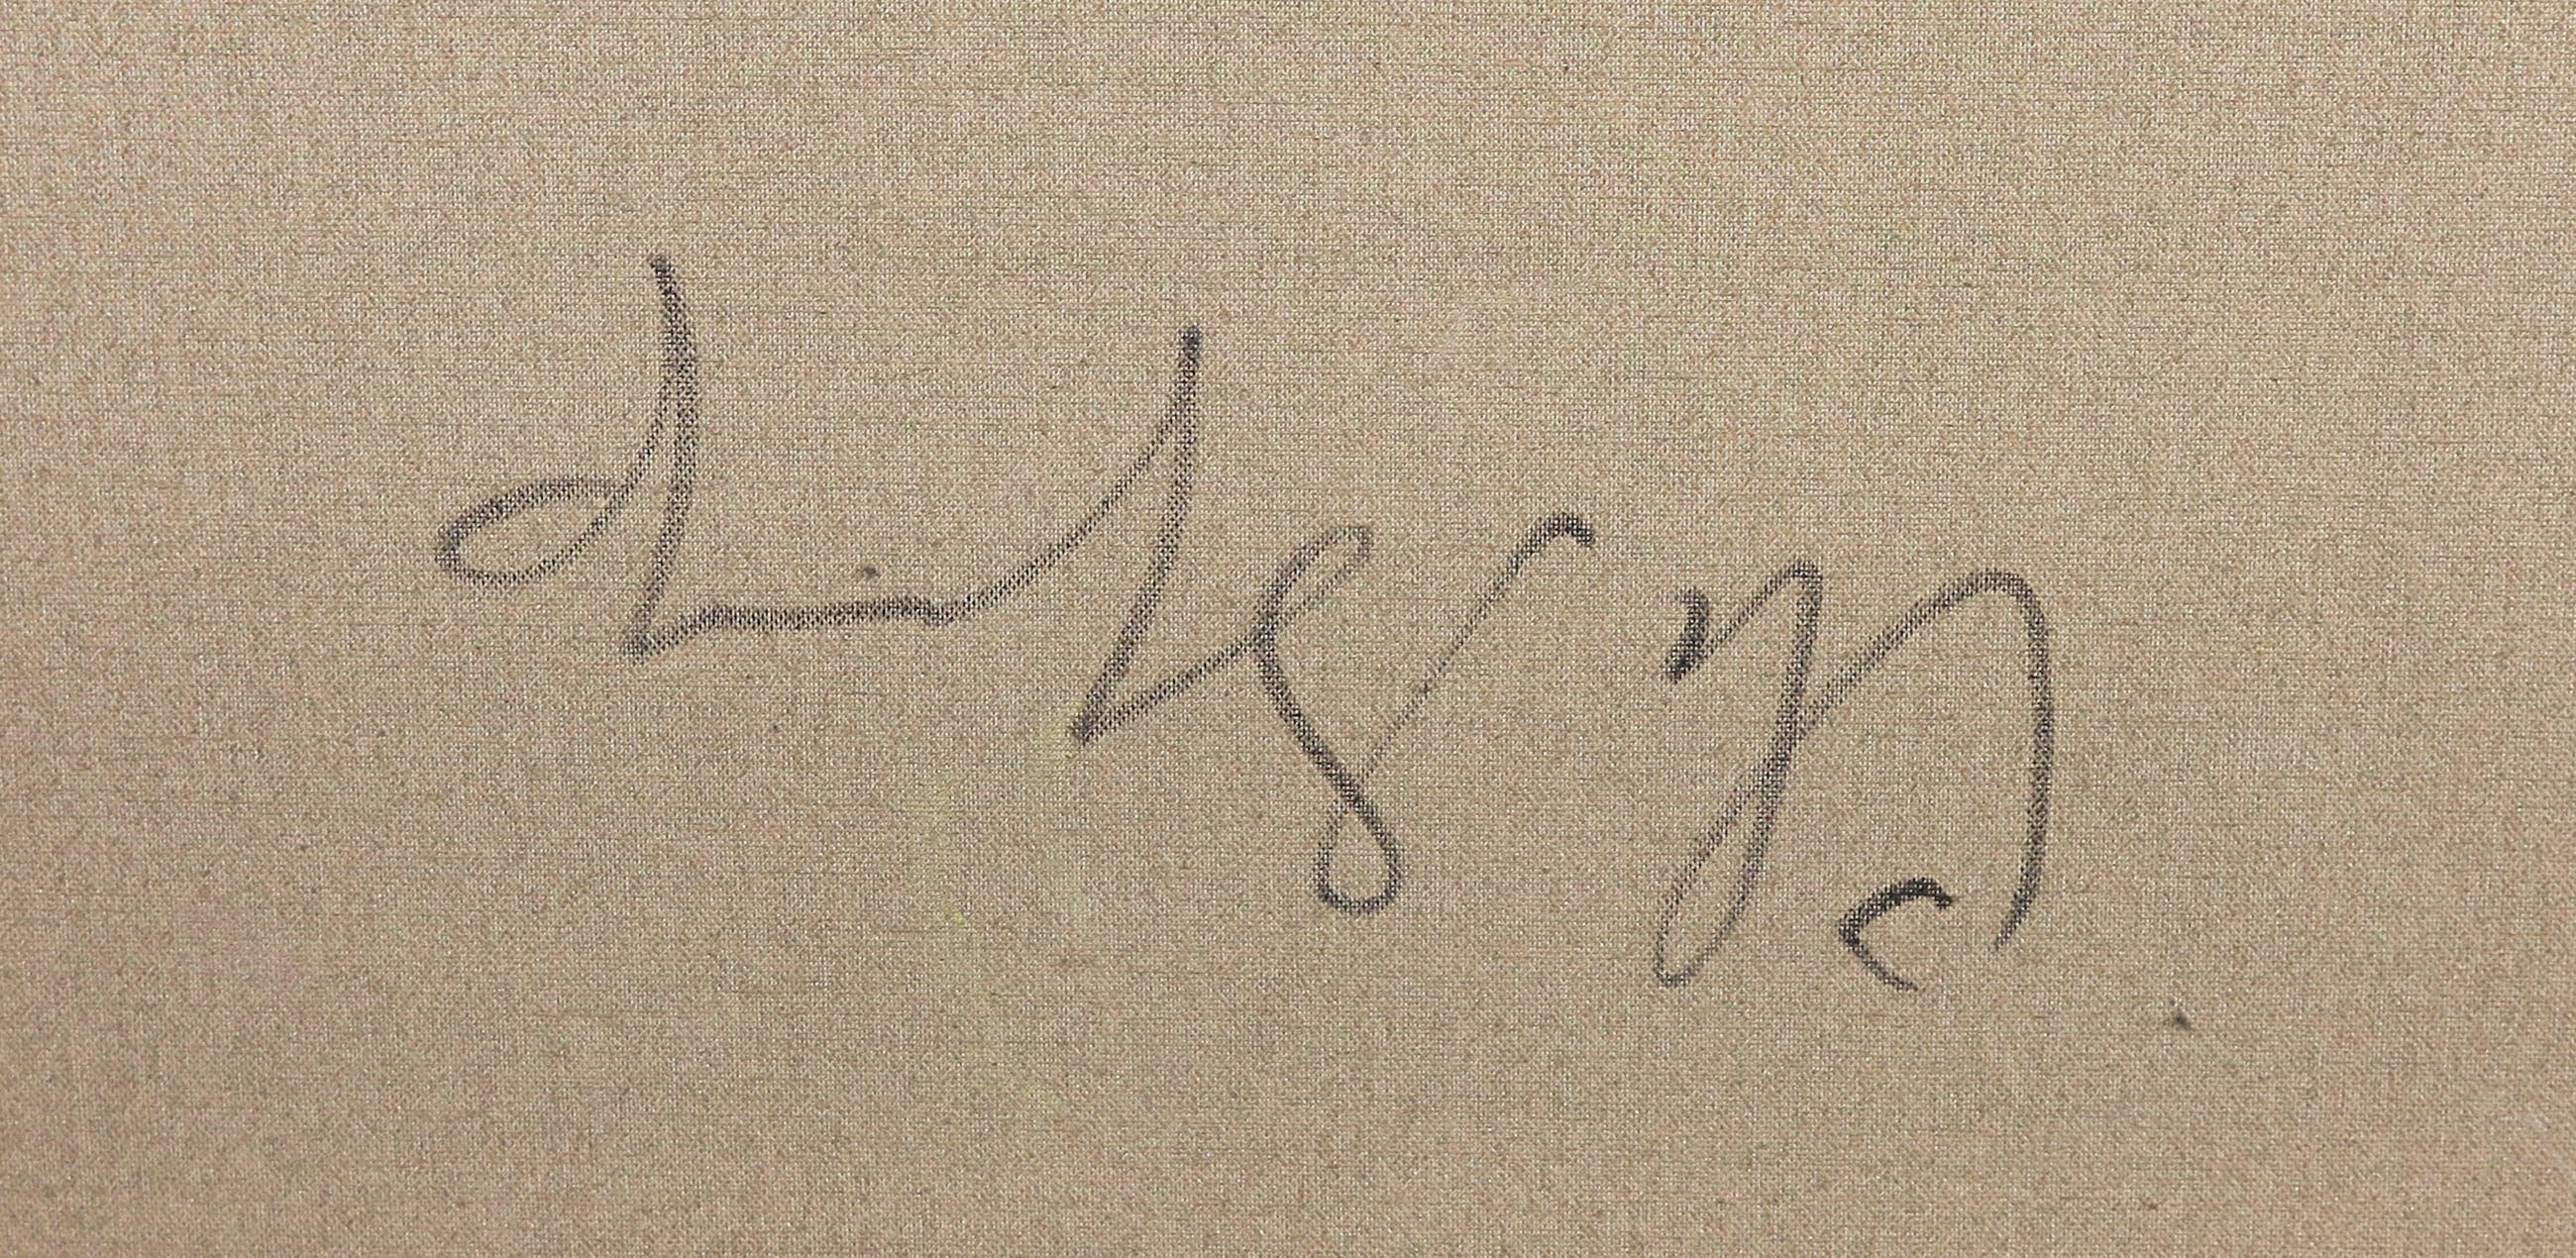 Christine Spierings - Olieverf op doek, Z.t. Abstracte vorm (Groot) kopen? Bied vanaf 1!